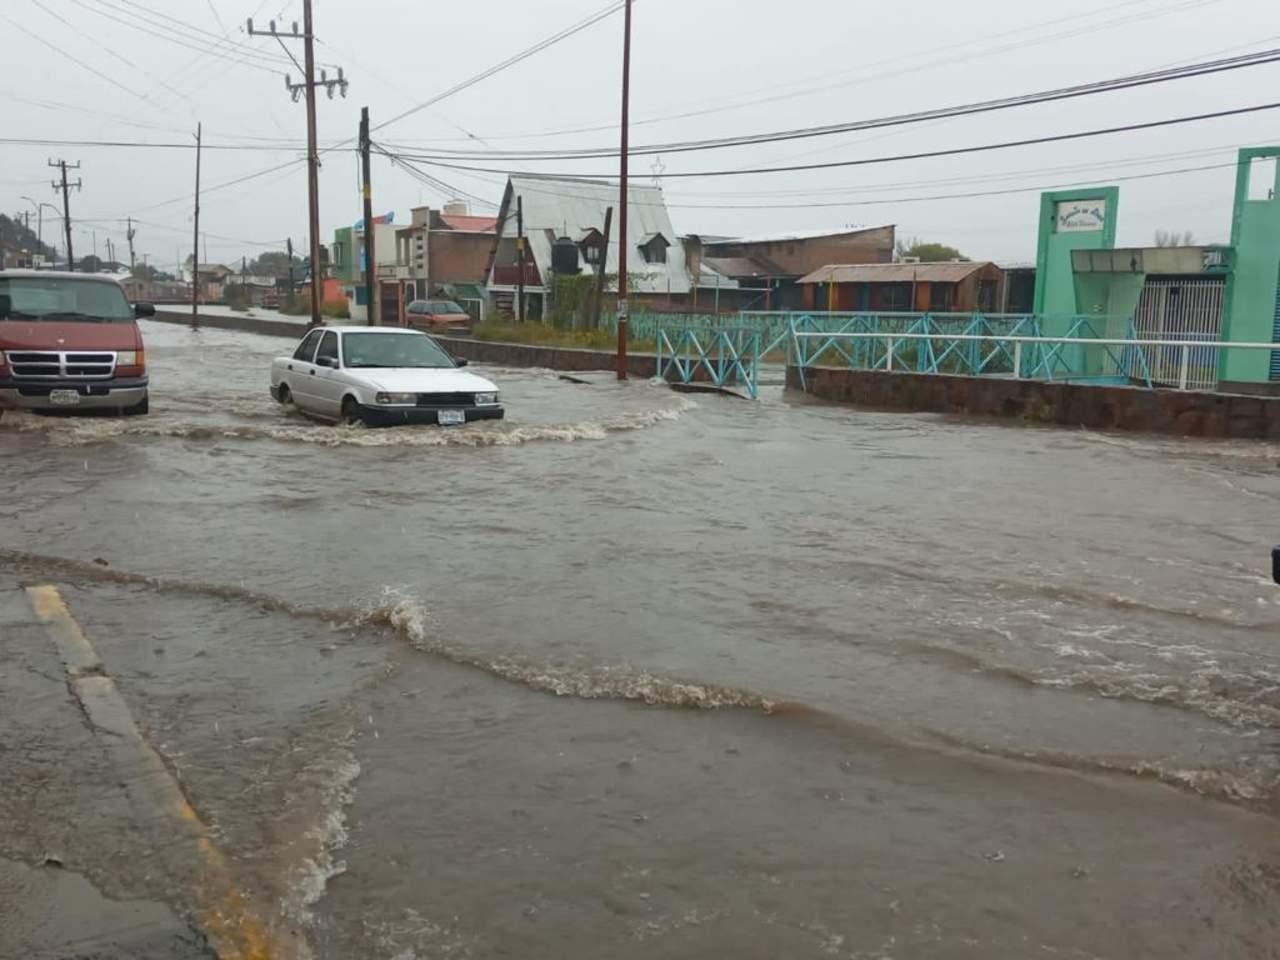 Se registraron lluvias en 34 municipios de Durango